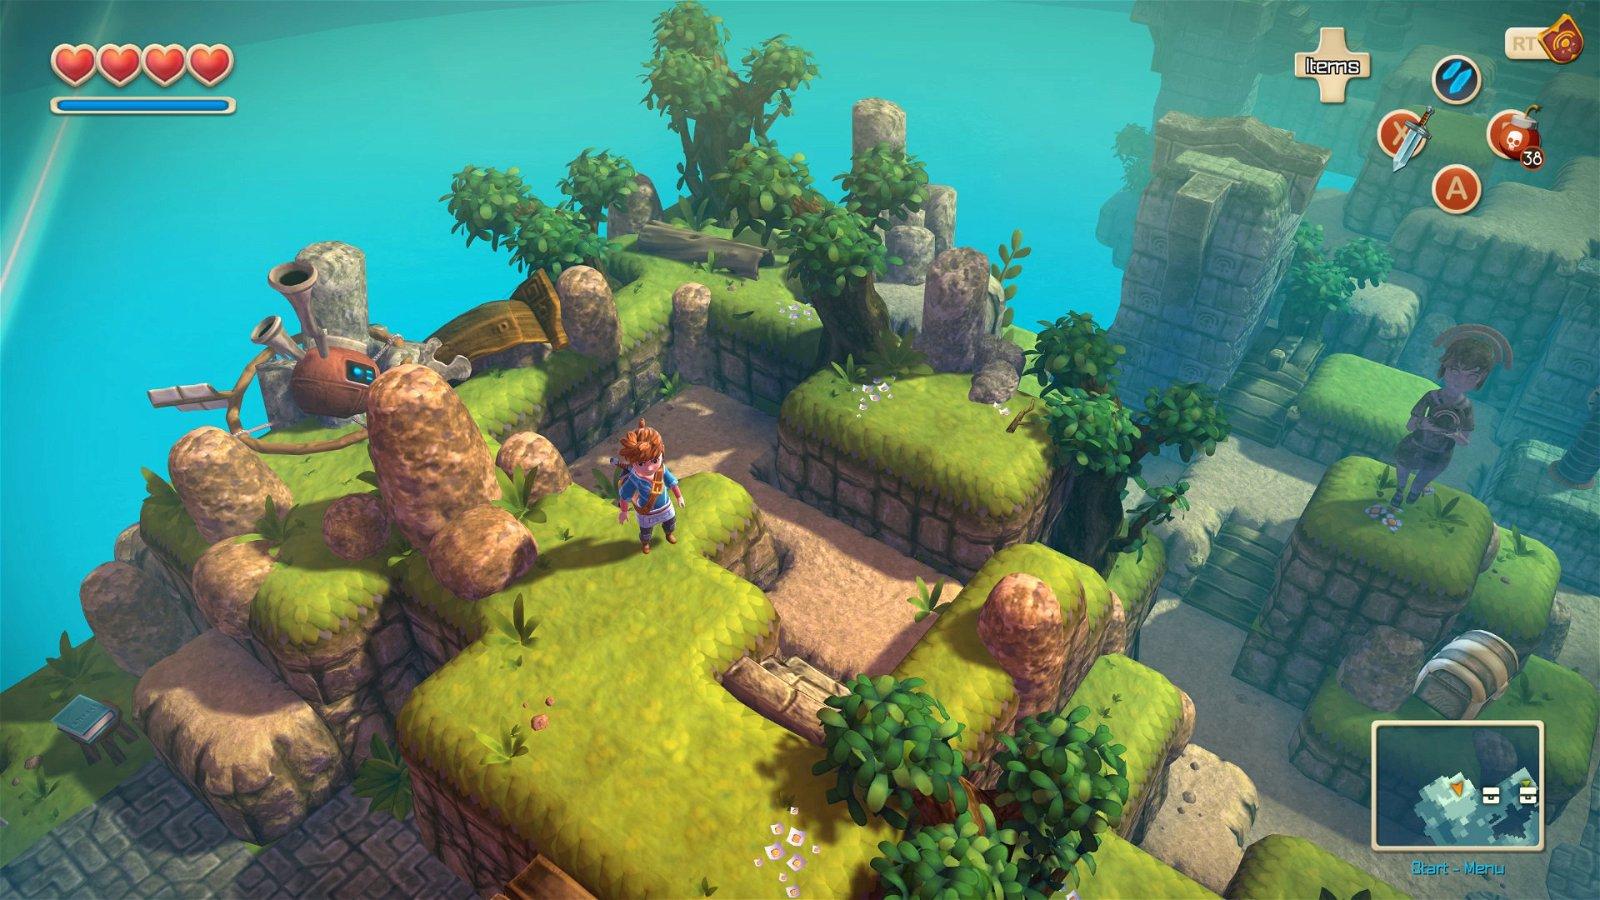 Oceanhorn: Monster Of Uncharted Seas (Ps4) Review 4